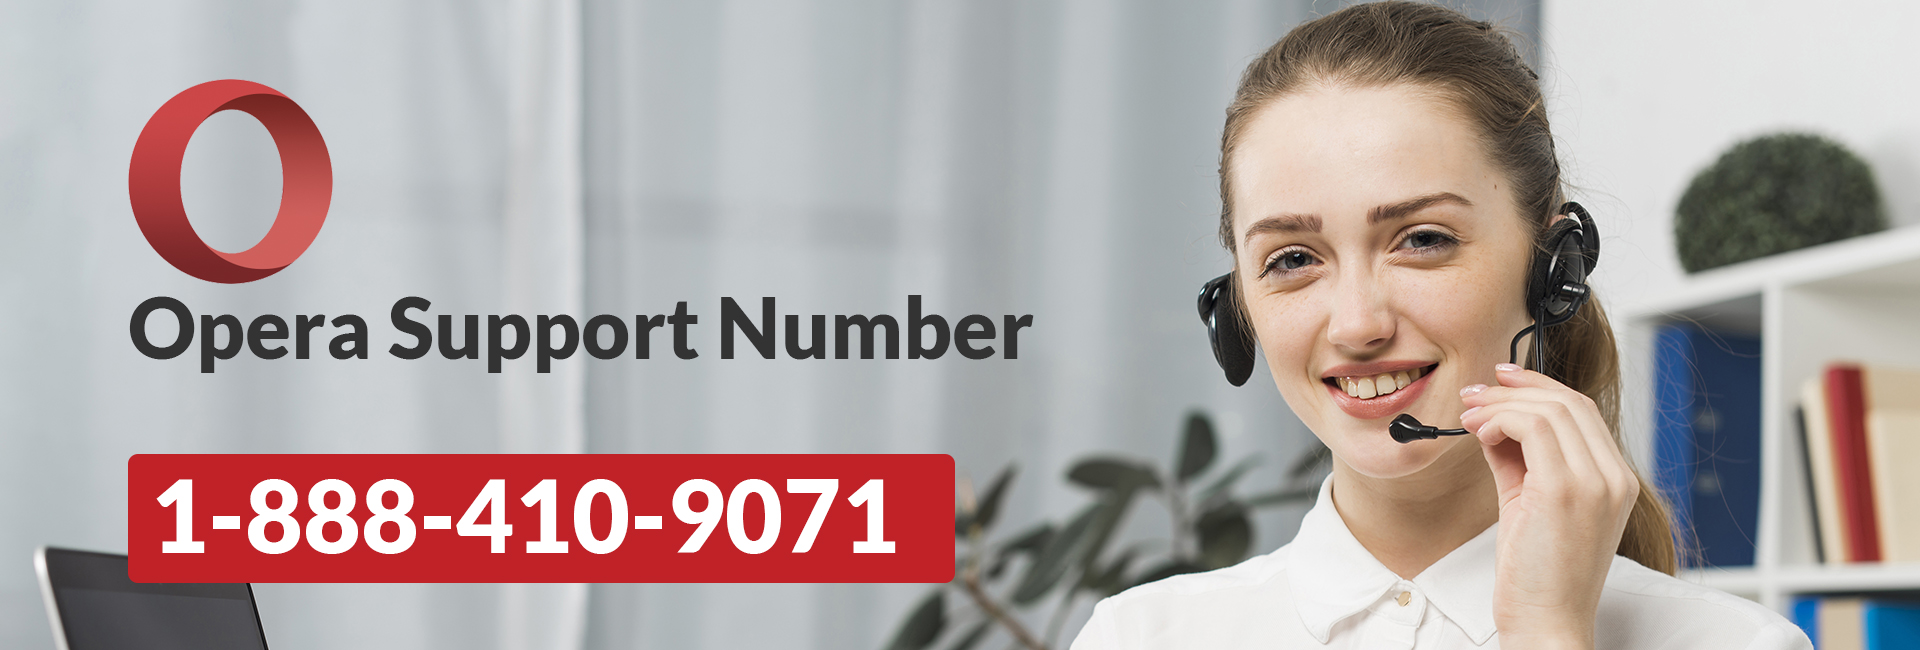 Opera Customer Service 1-888-410-9071